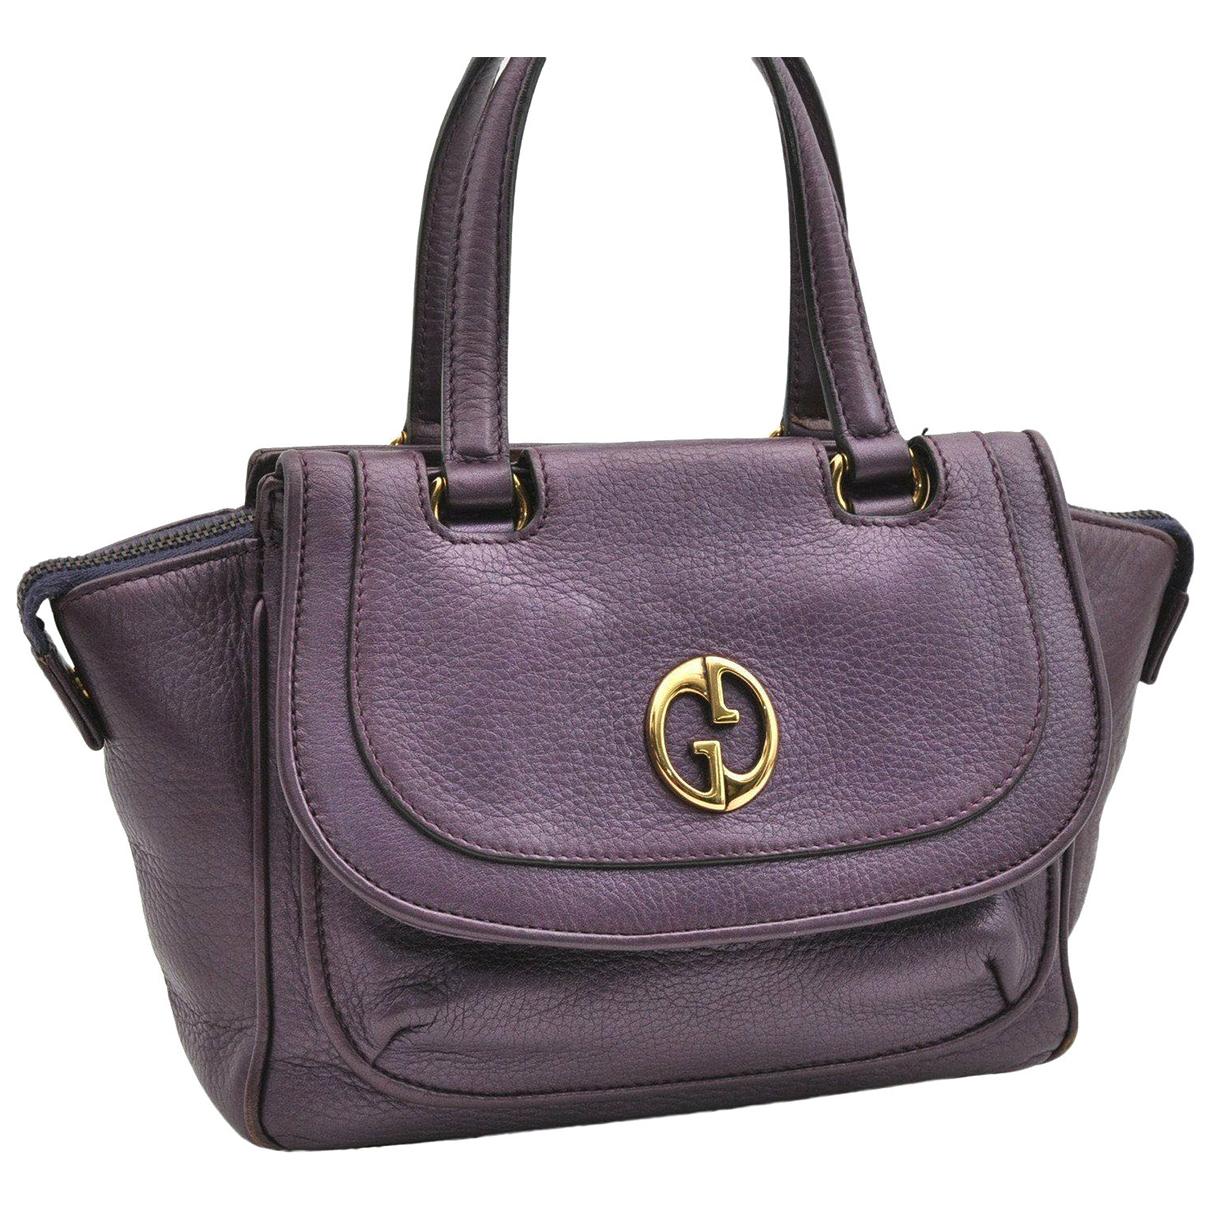 Gucci N Purple Leather handbag for Women N